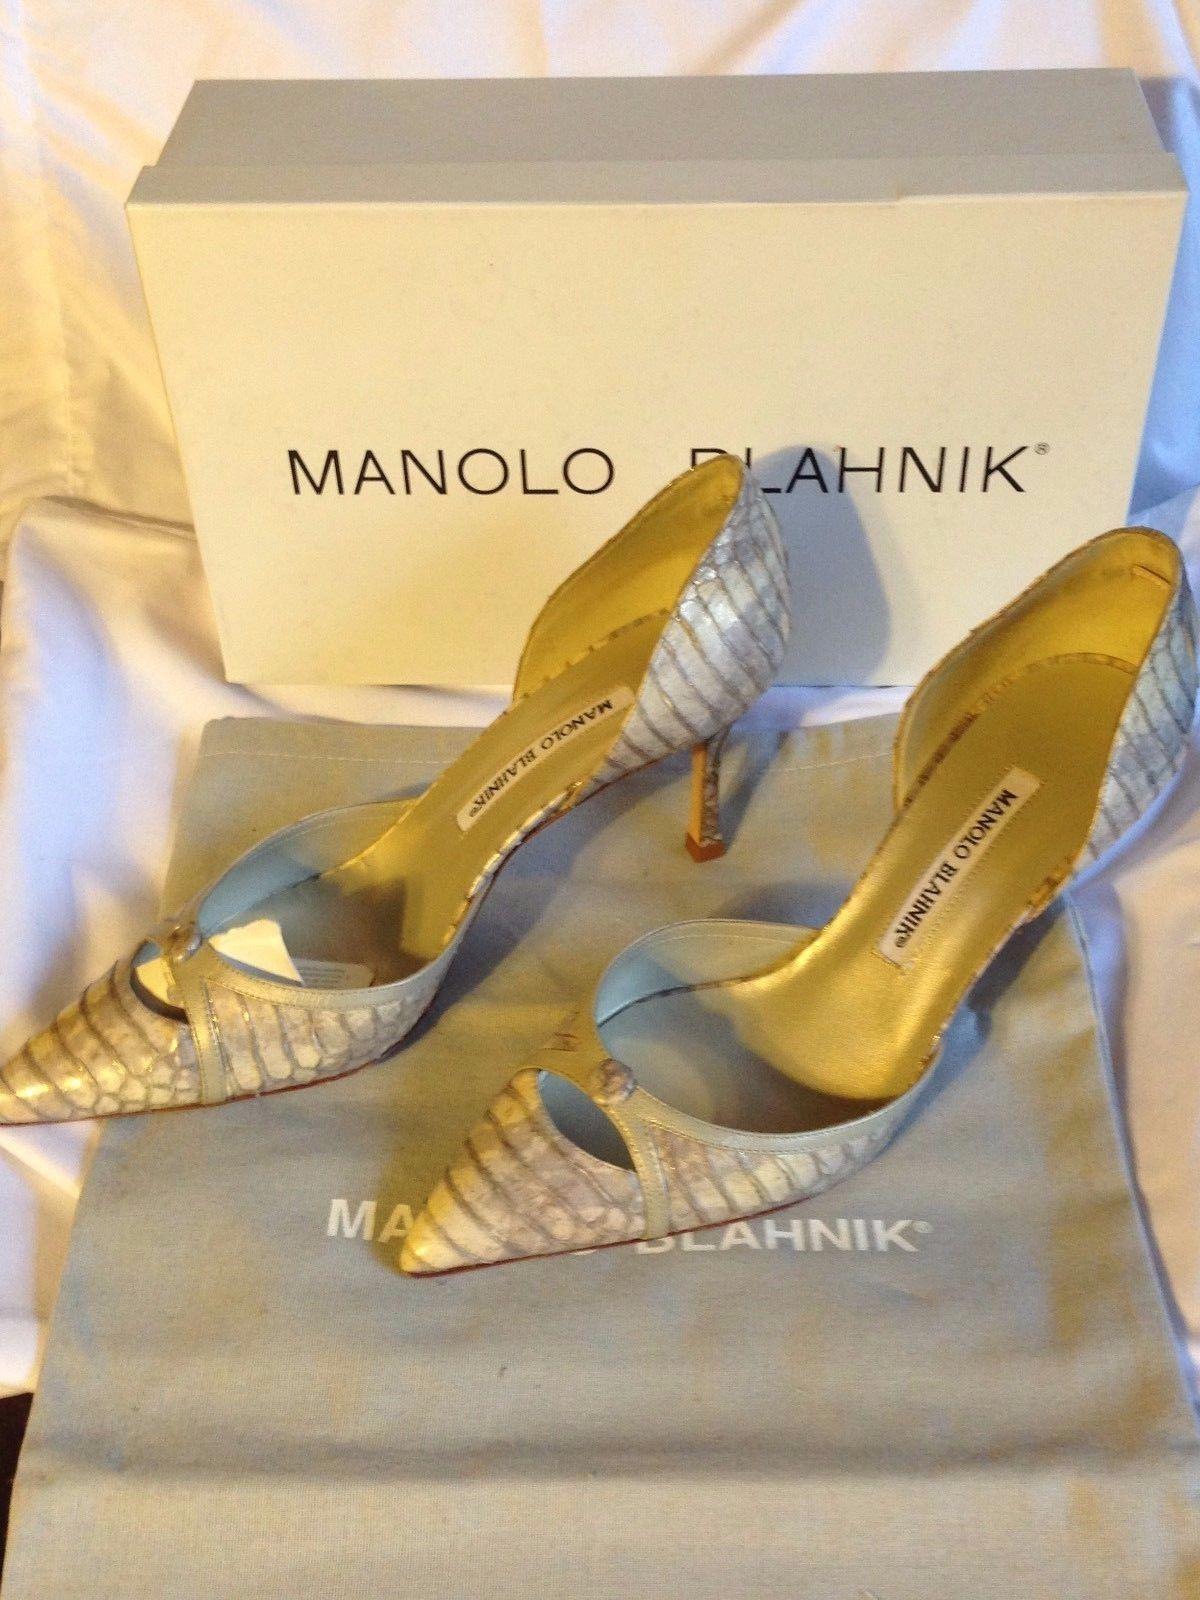 f7e19756f1424 S l1600. S l1600. Previous. Manolo Blahnik Nappa Bronze ans Golden Snake  Skin Python Pumps Size 37.5